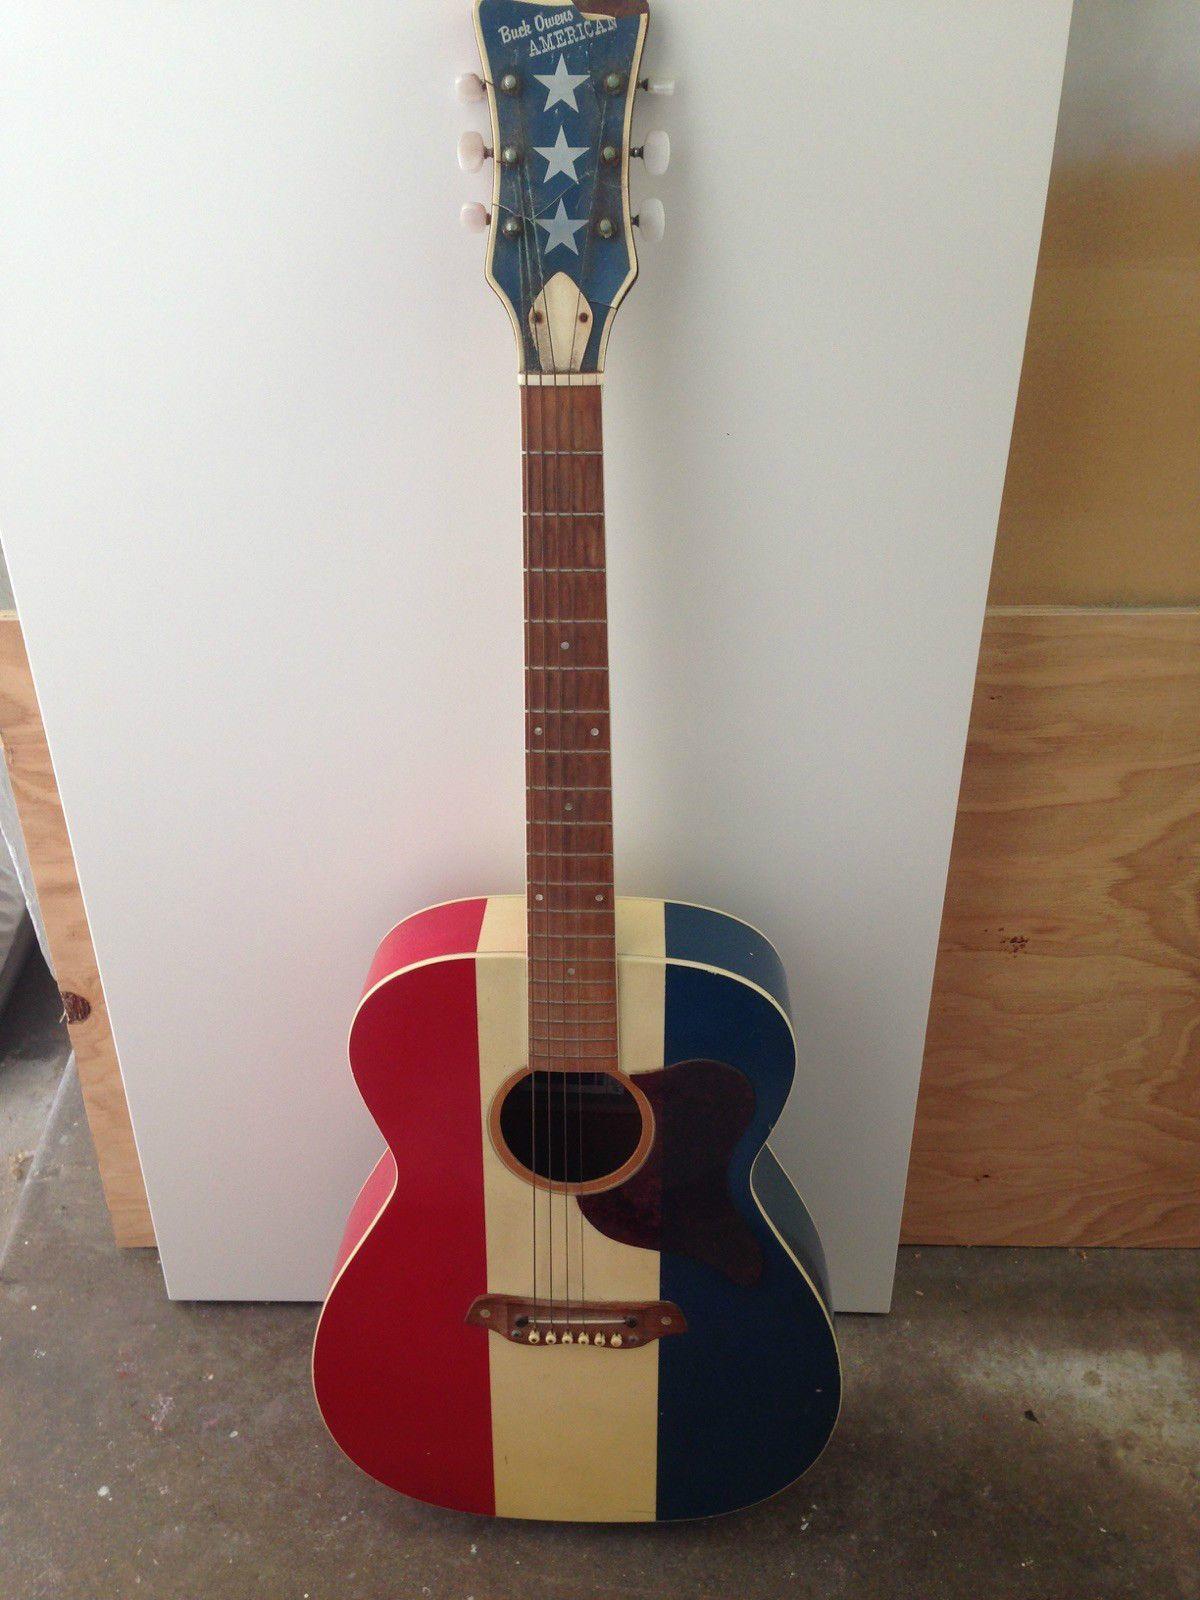 Buck Owens Harmony Sears American Guitar Cool Stuff Pinterest